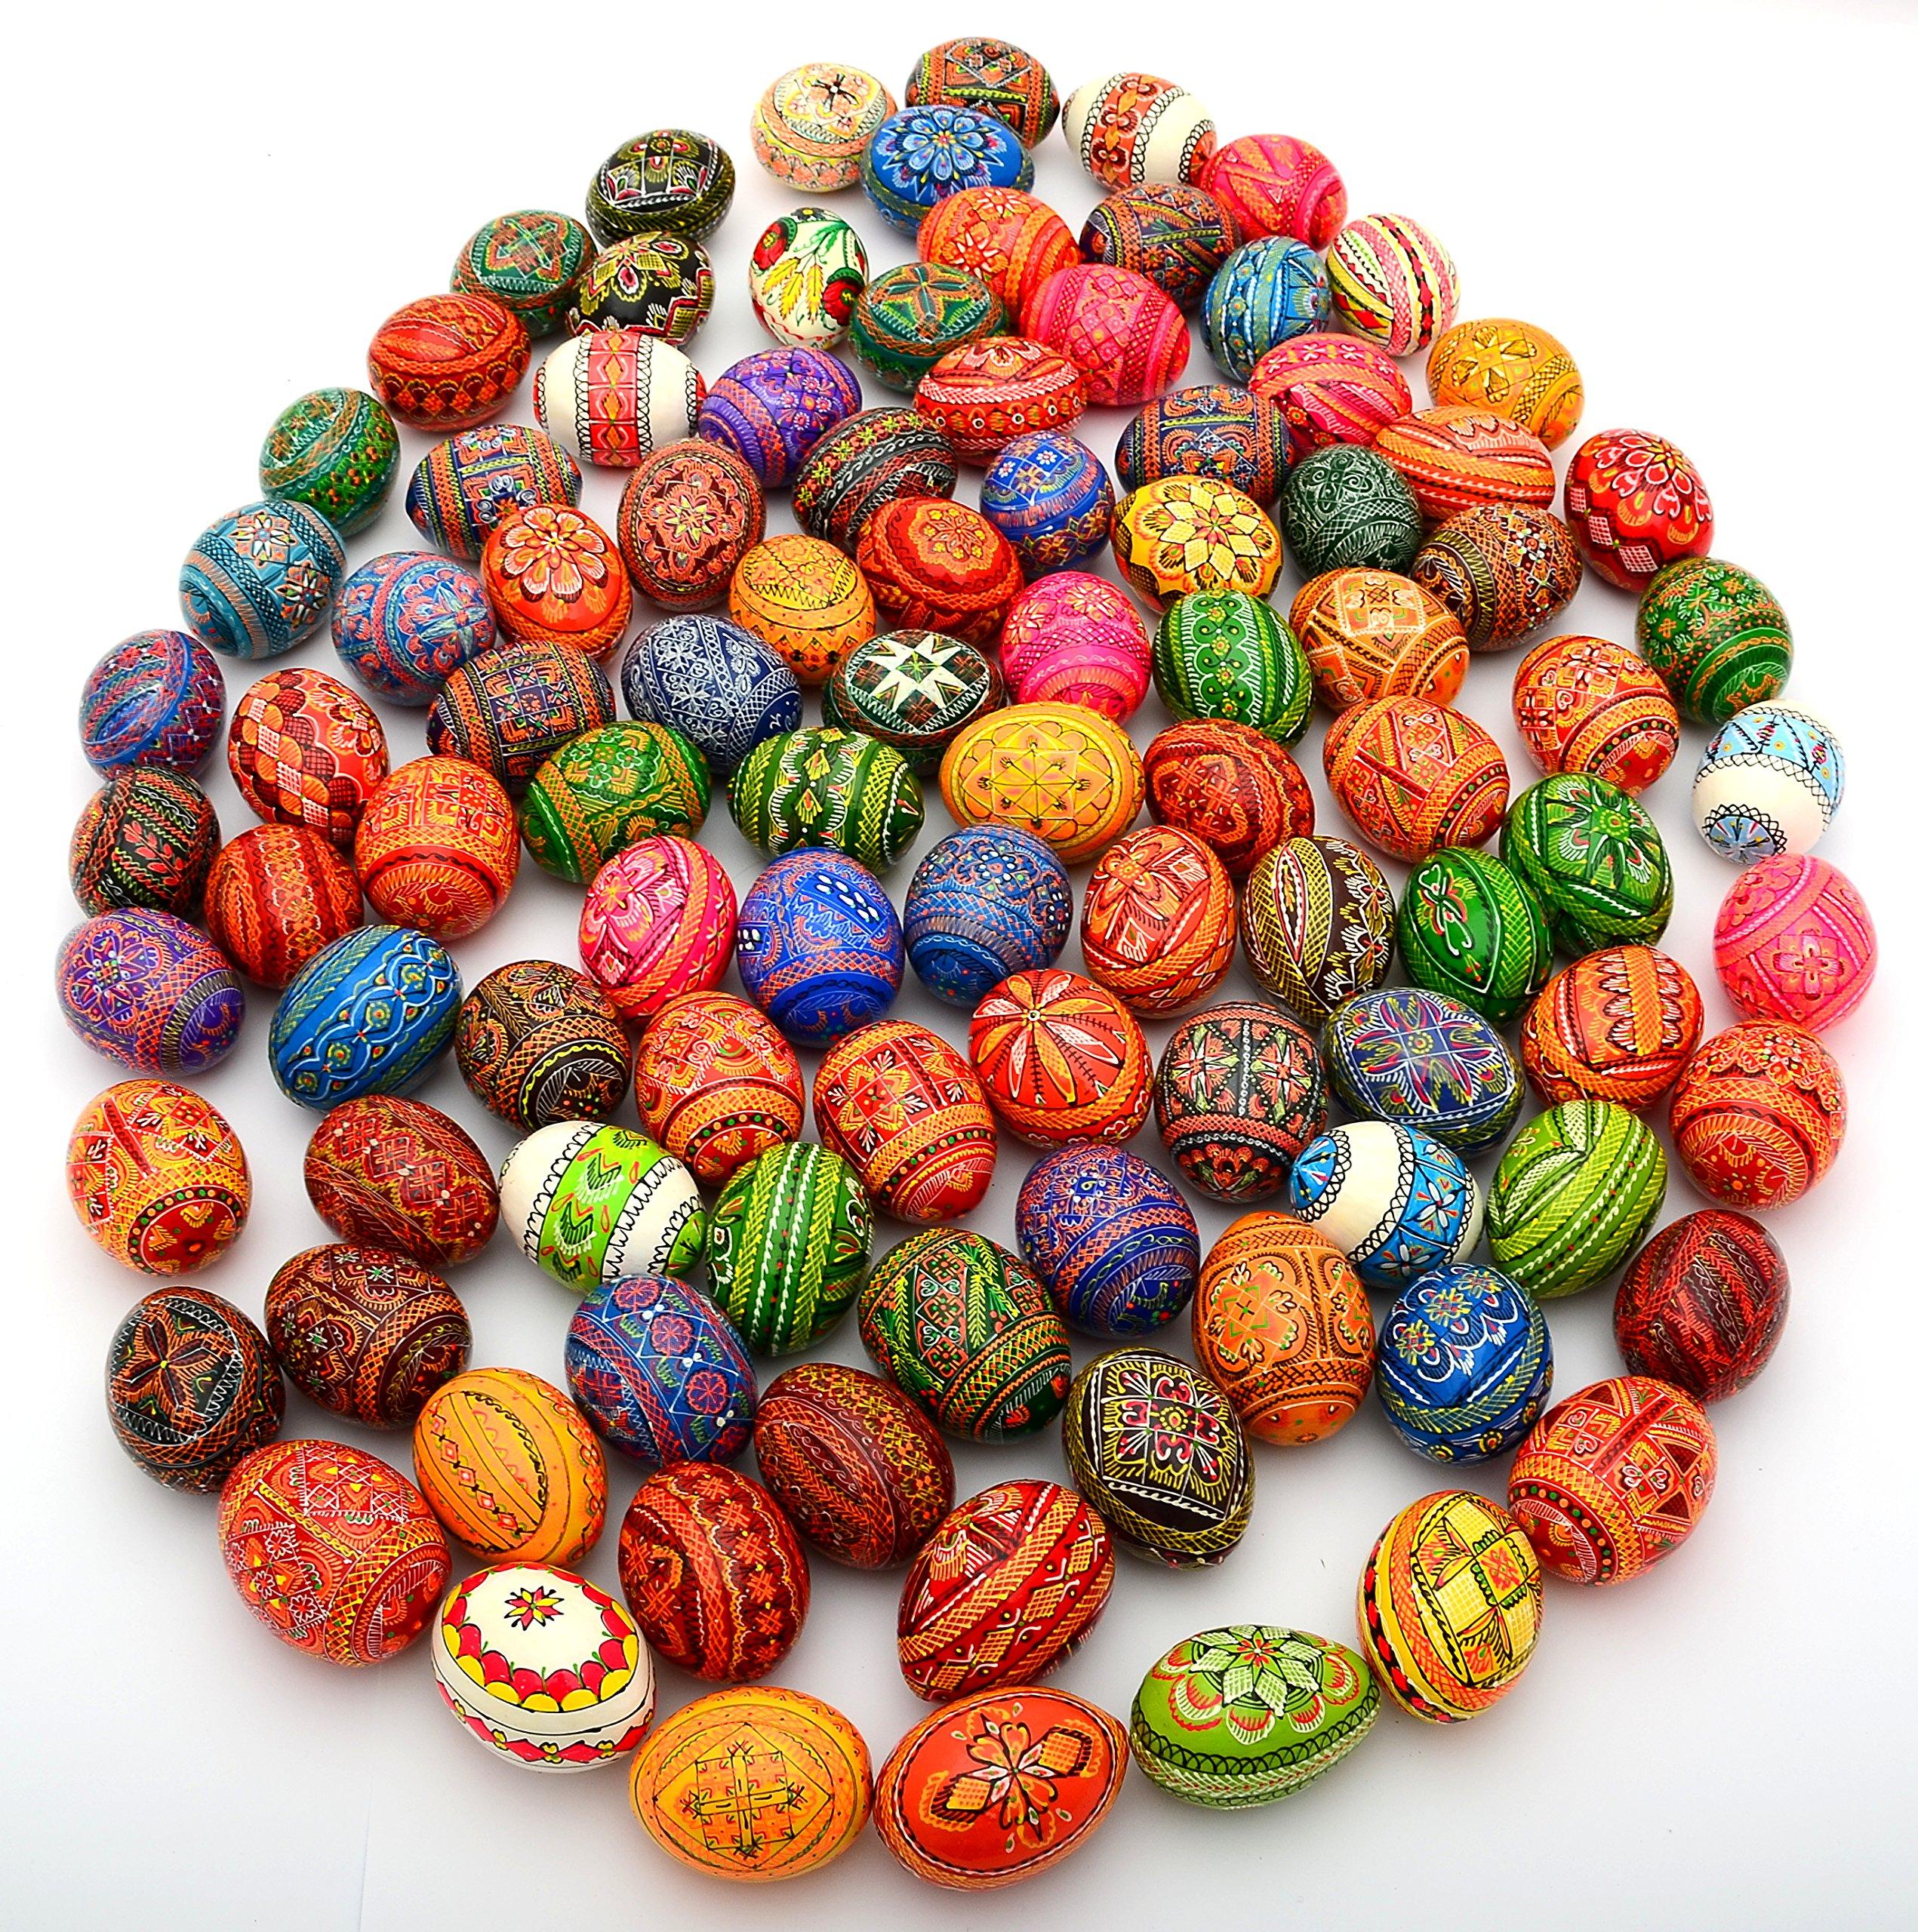 Easter Painted Eggs Wooden Ukrainian Pysanky Pysanka, Set of 500 by Unknown